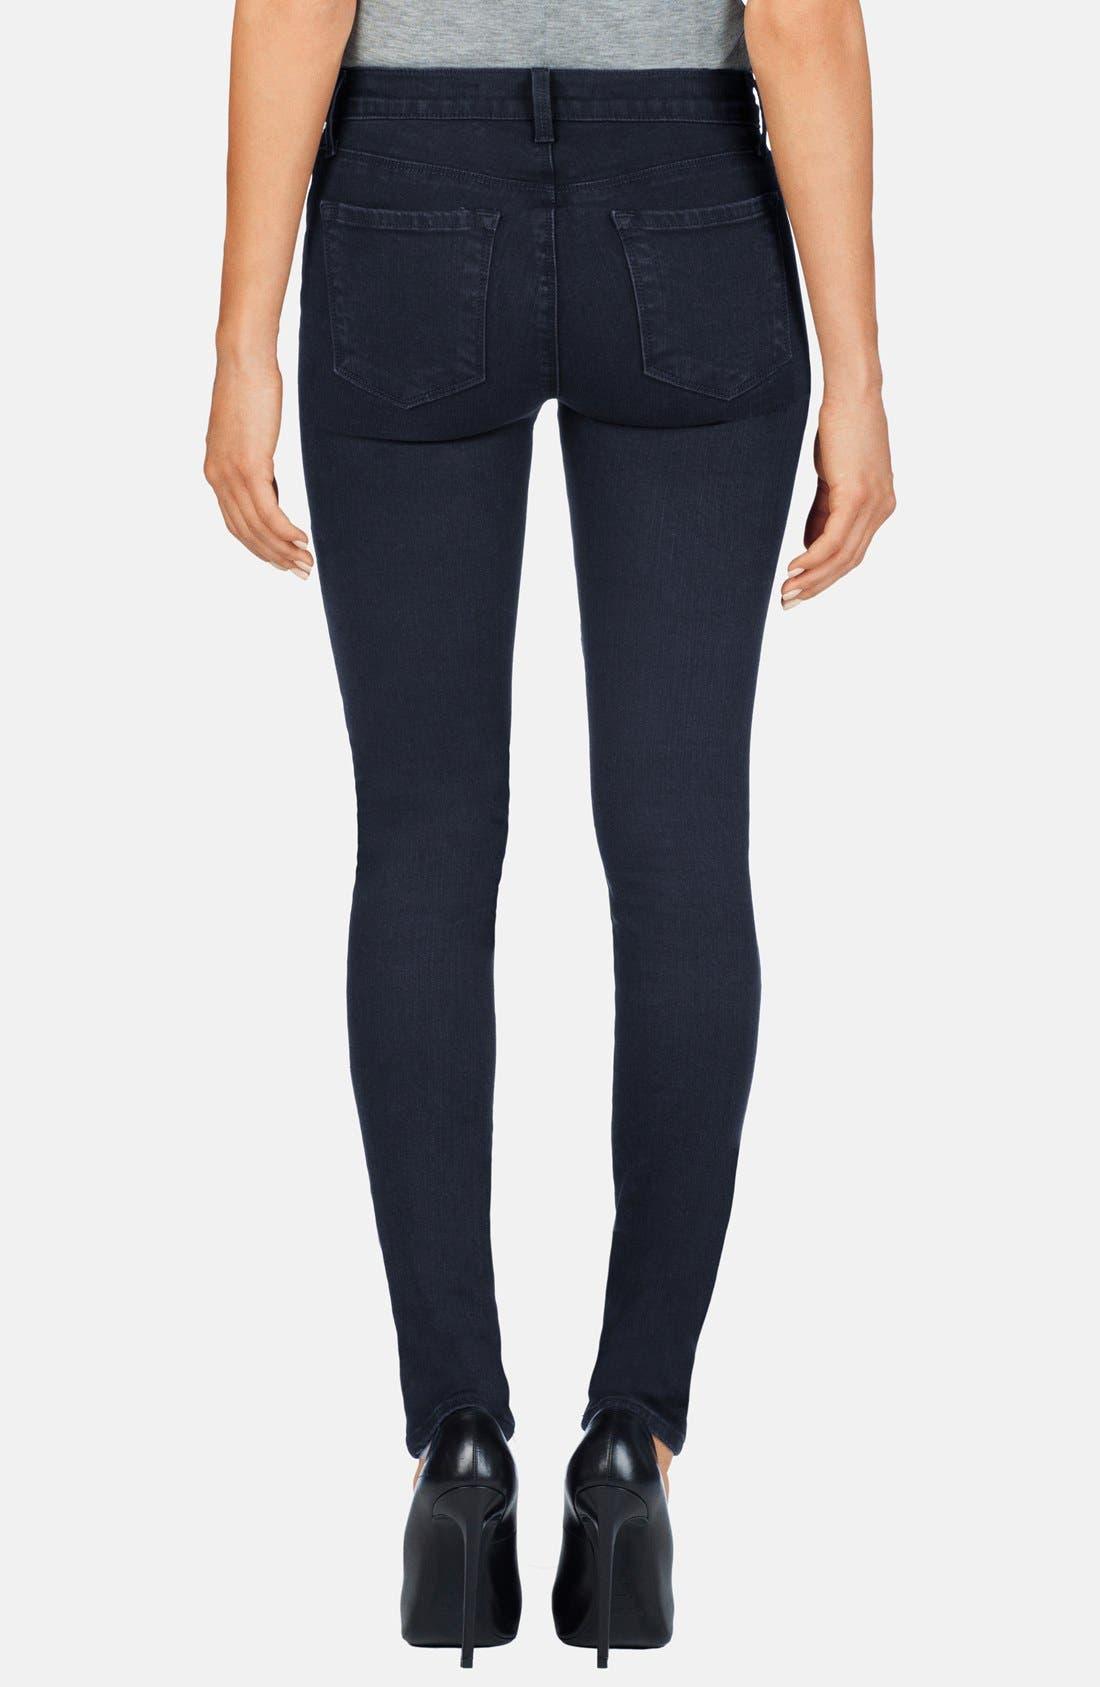 Alternate Image 2  - J Brand 'Nova' Paneled Skinny Jeans (Bluebird)